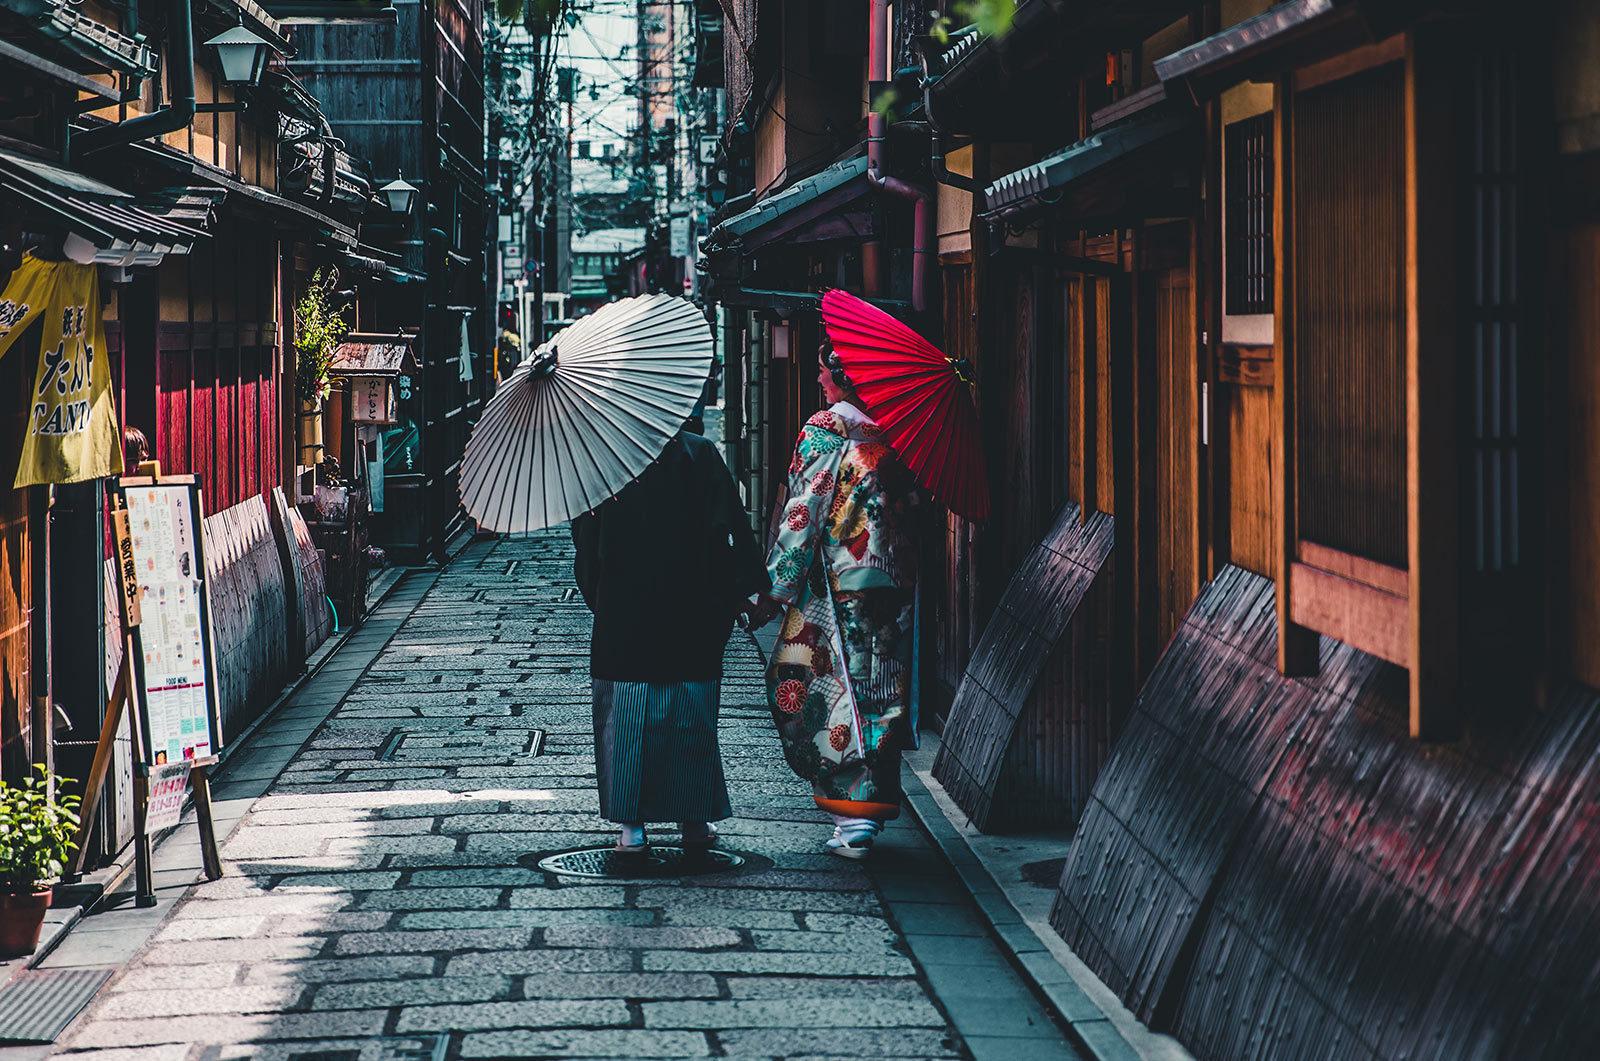 Two women with parasols walking down backstreet in Asia.